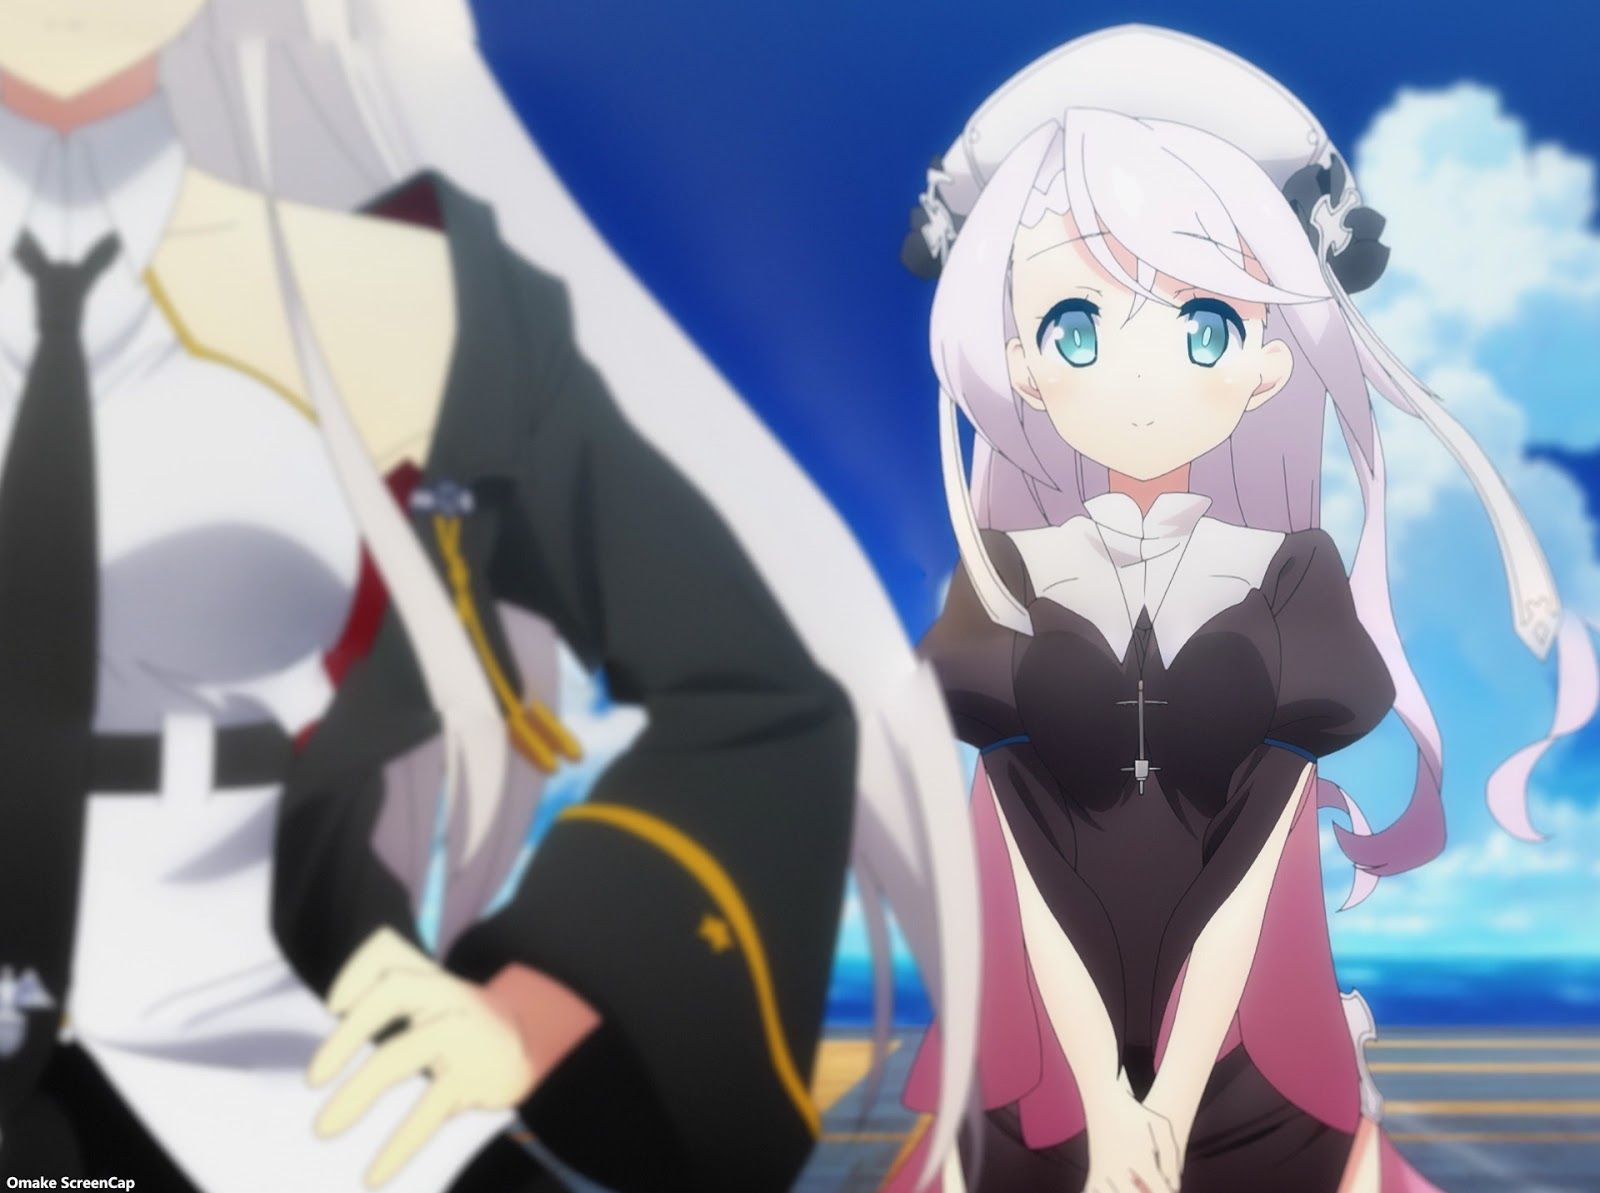 10 Second Anime Azur Lane Episode 1 в 2020 г Аниме